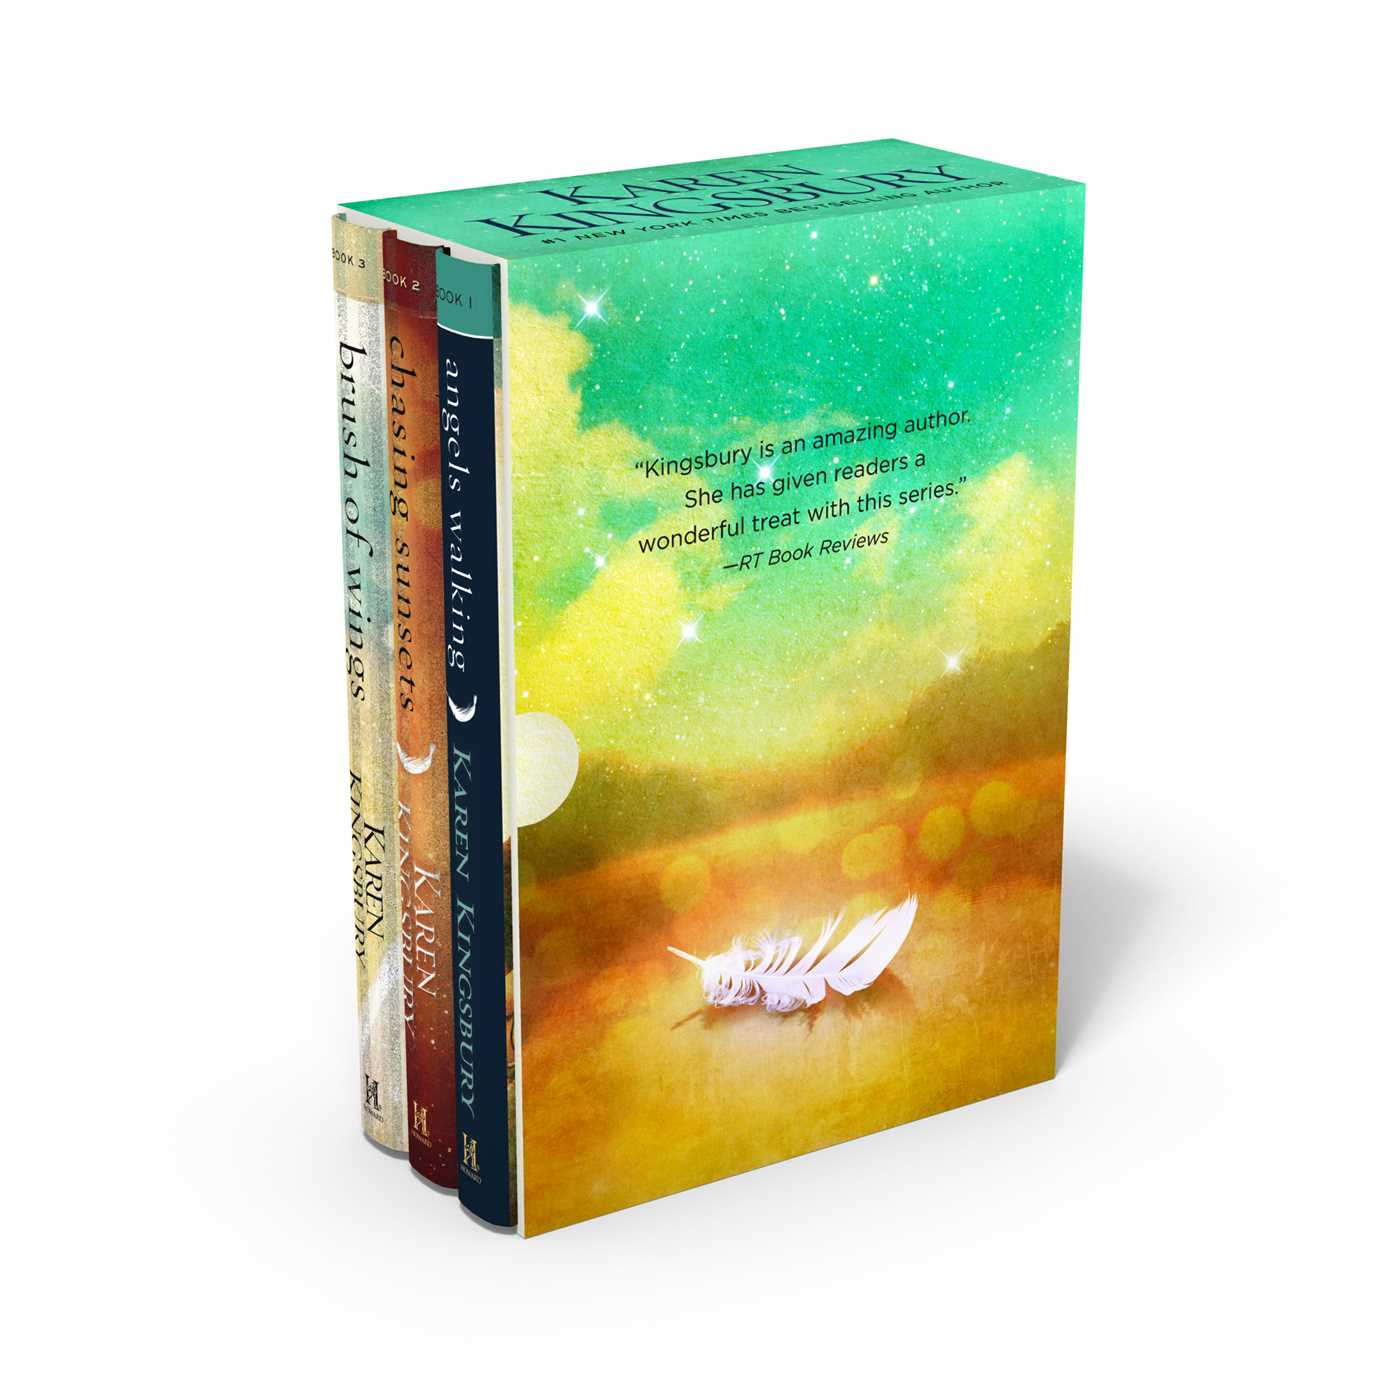 Angels walking box set 9781501189920 hr